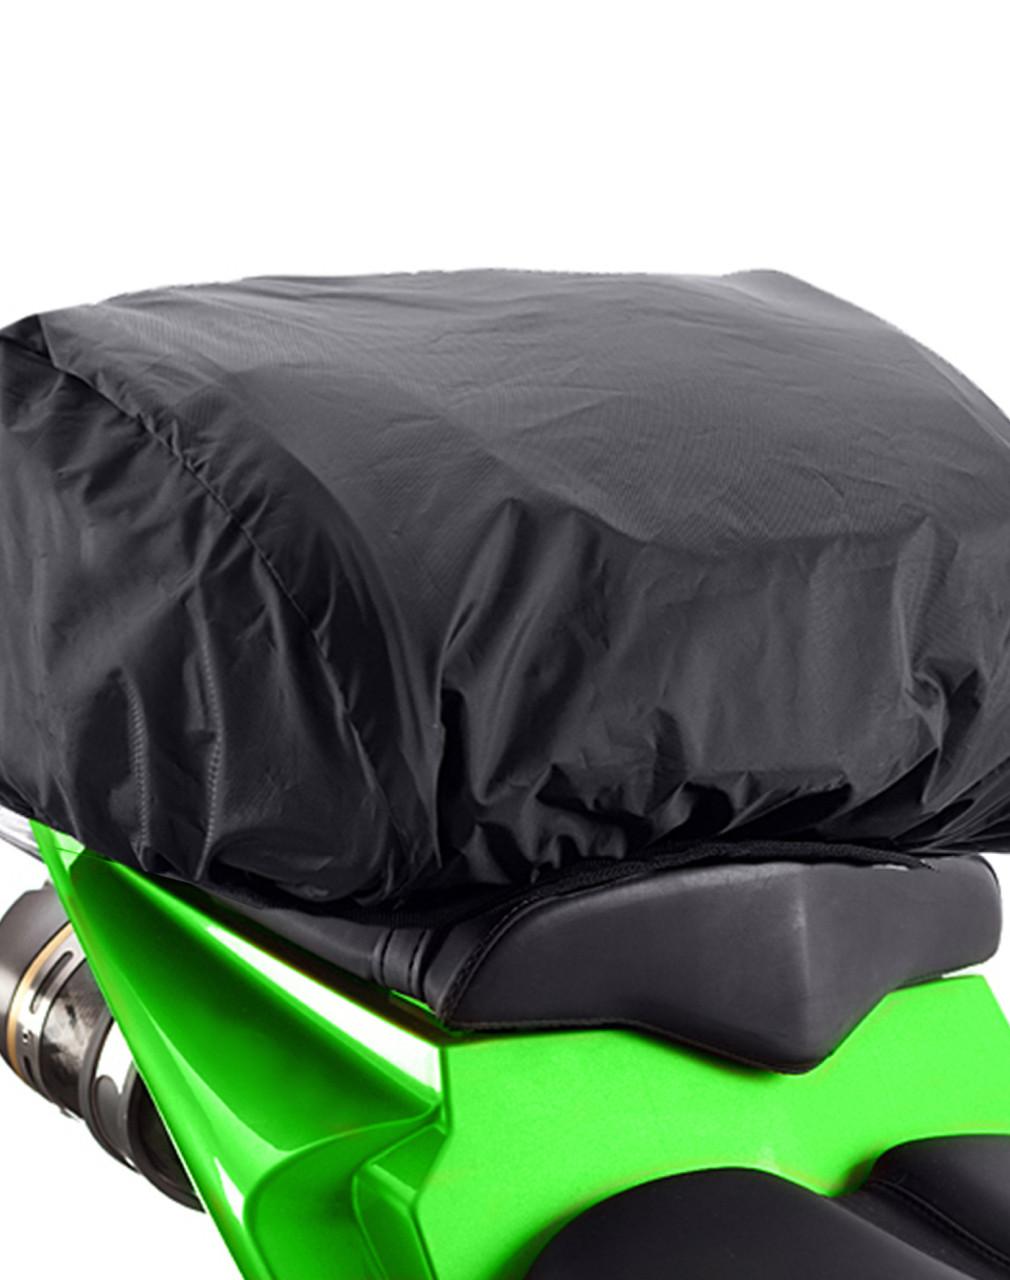 Harley Davidson Viking Sport Motorcycle Tail Bag Rain Cover